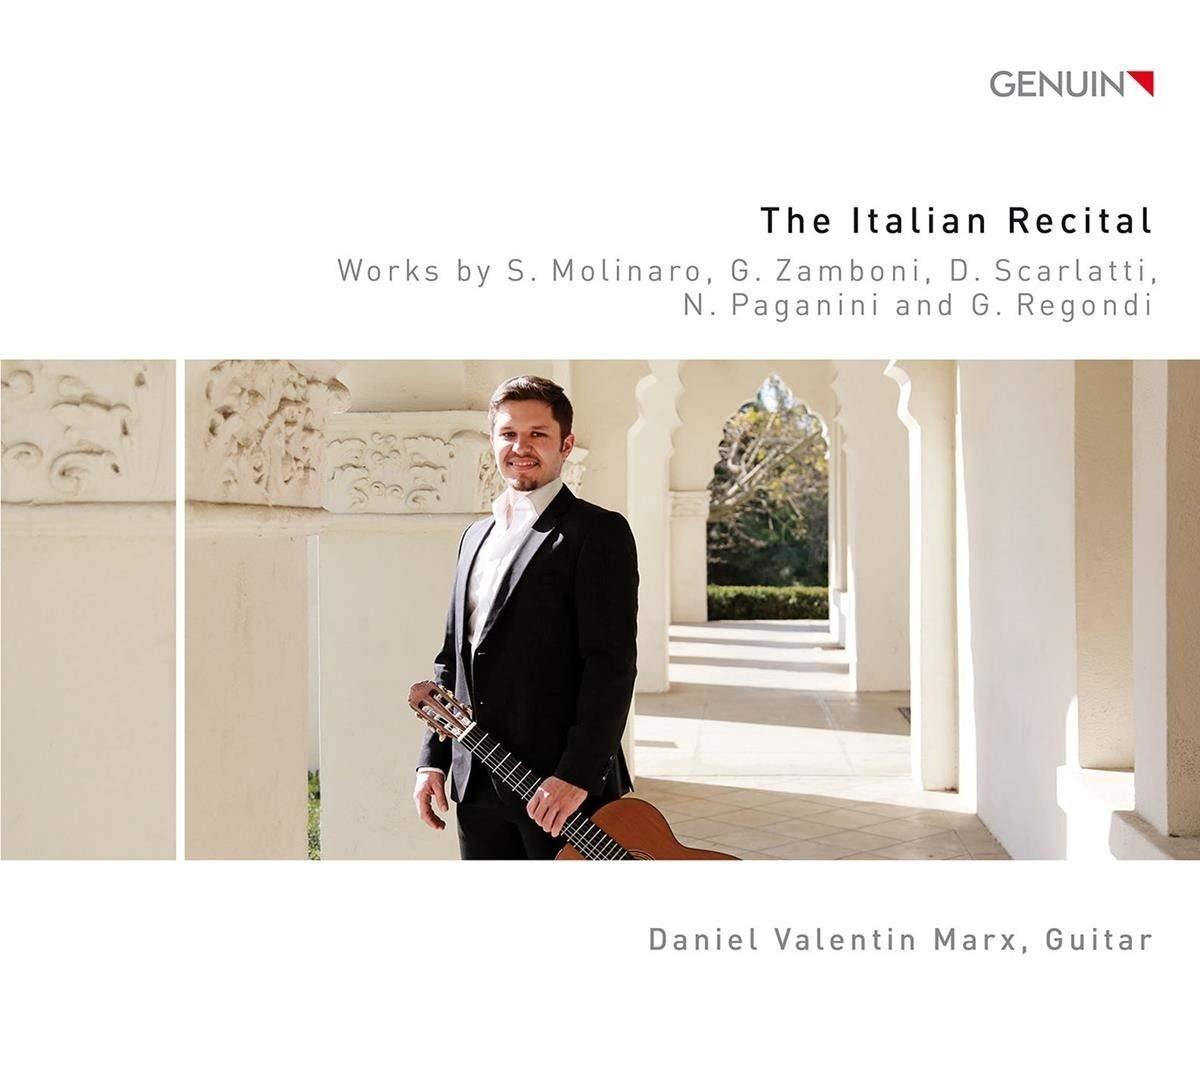 The Italian Recital - Daniel Valentin Marx